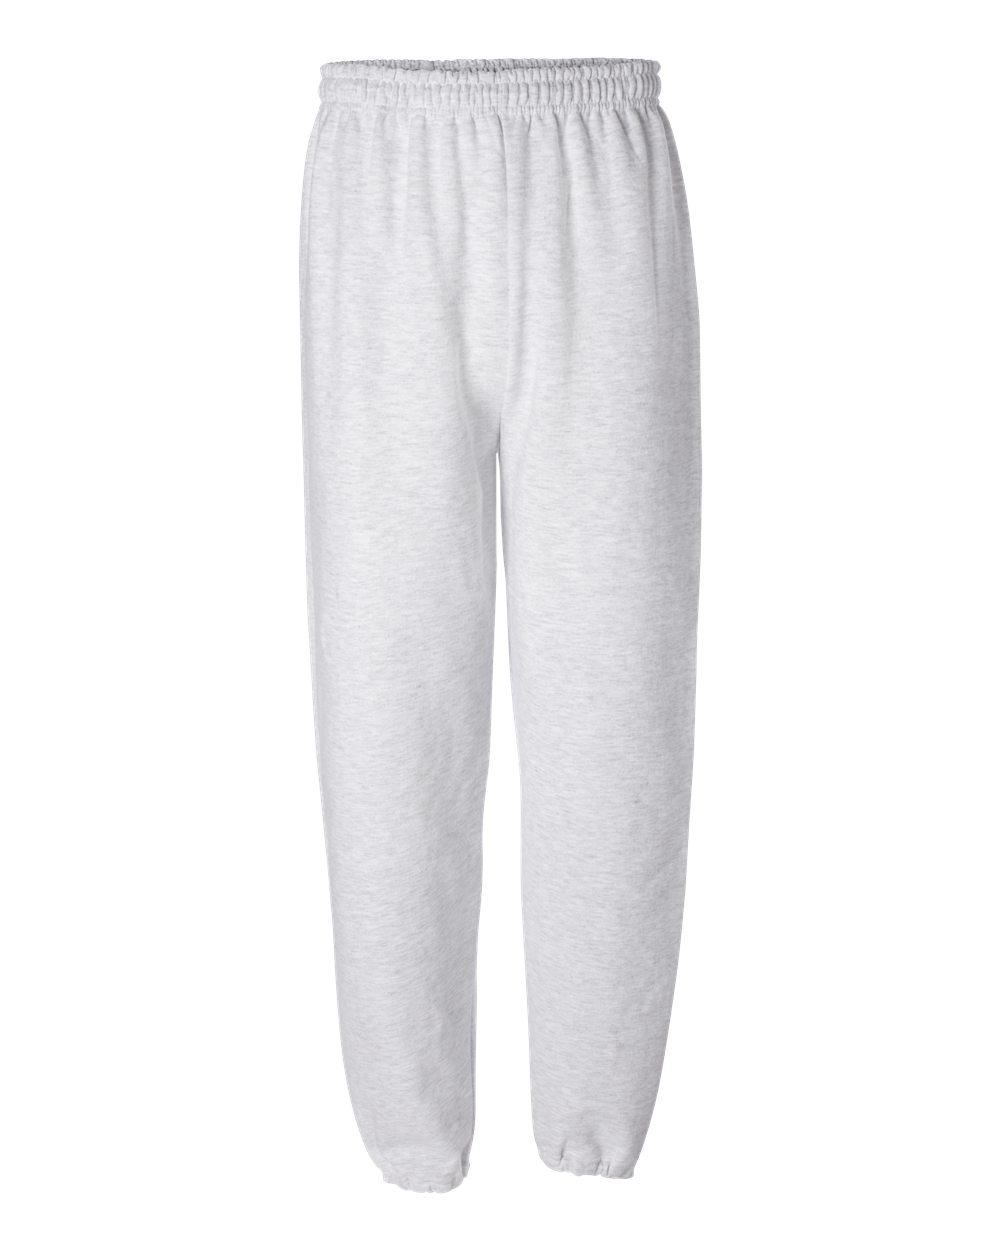 Gildan-Mens-Heavy-Blend-Sweatpants-18200-up-to-2XL thumbnail 6